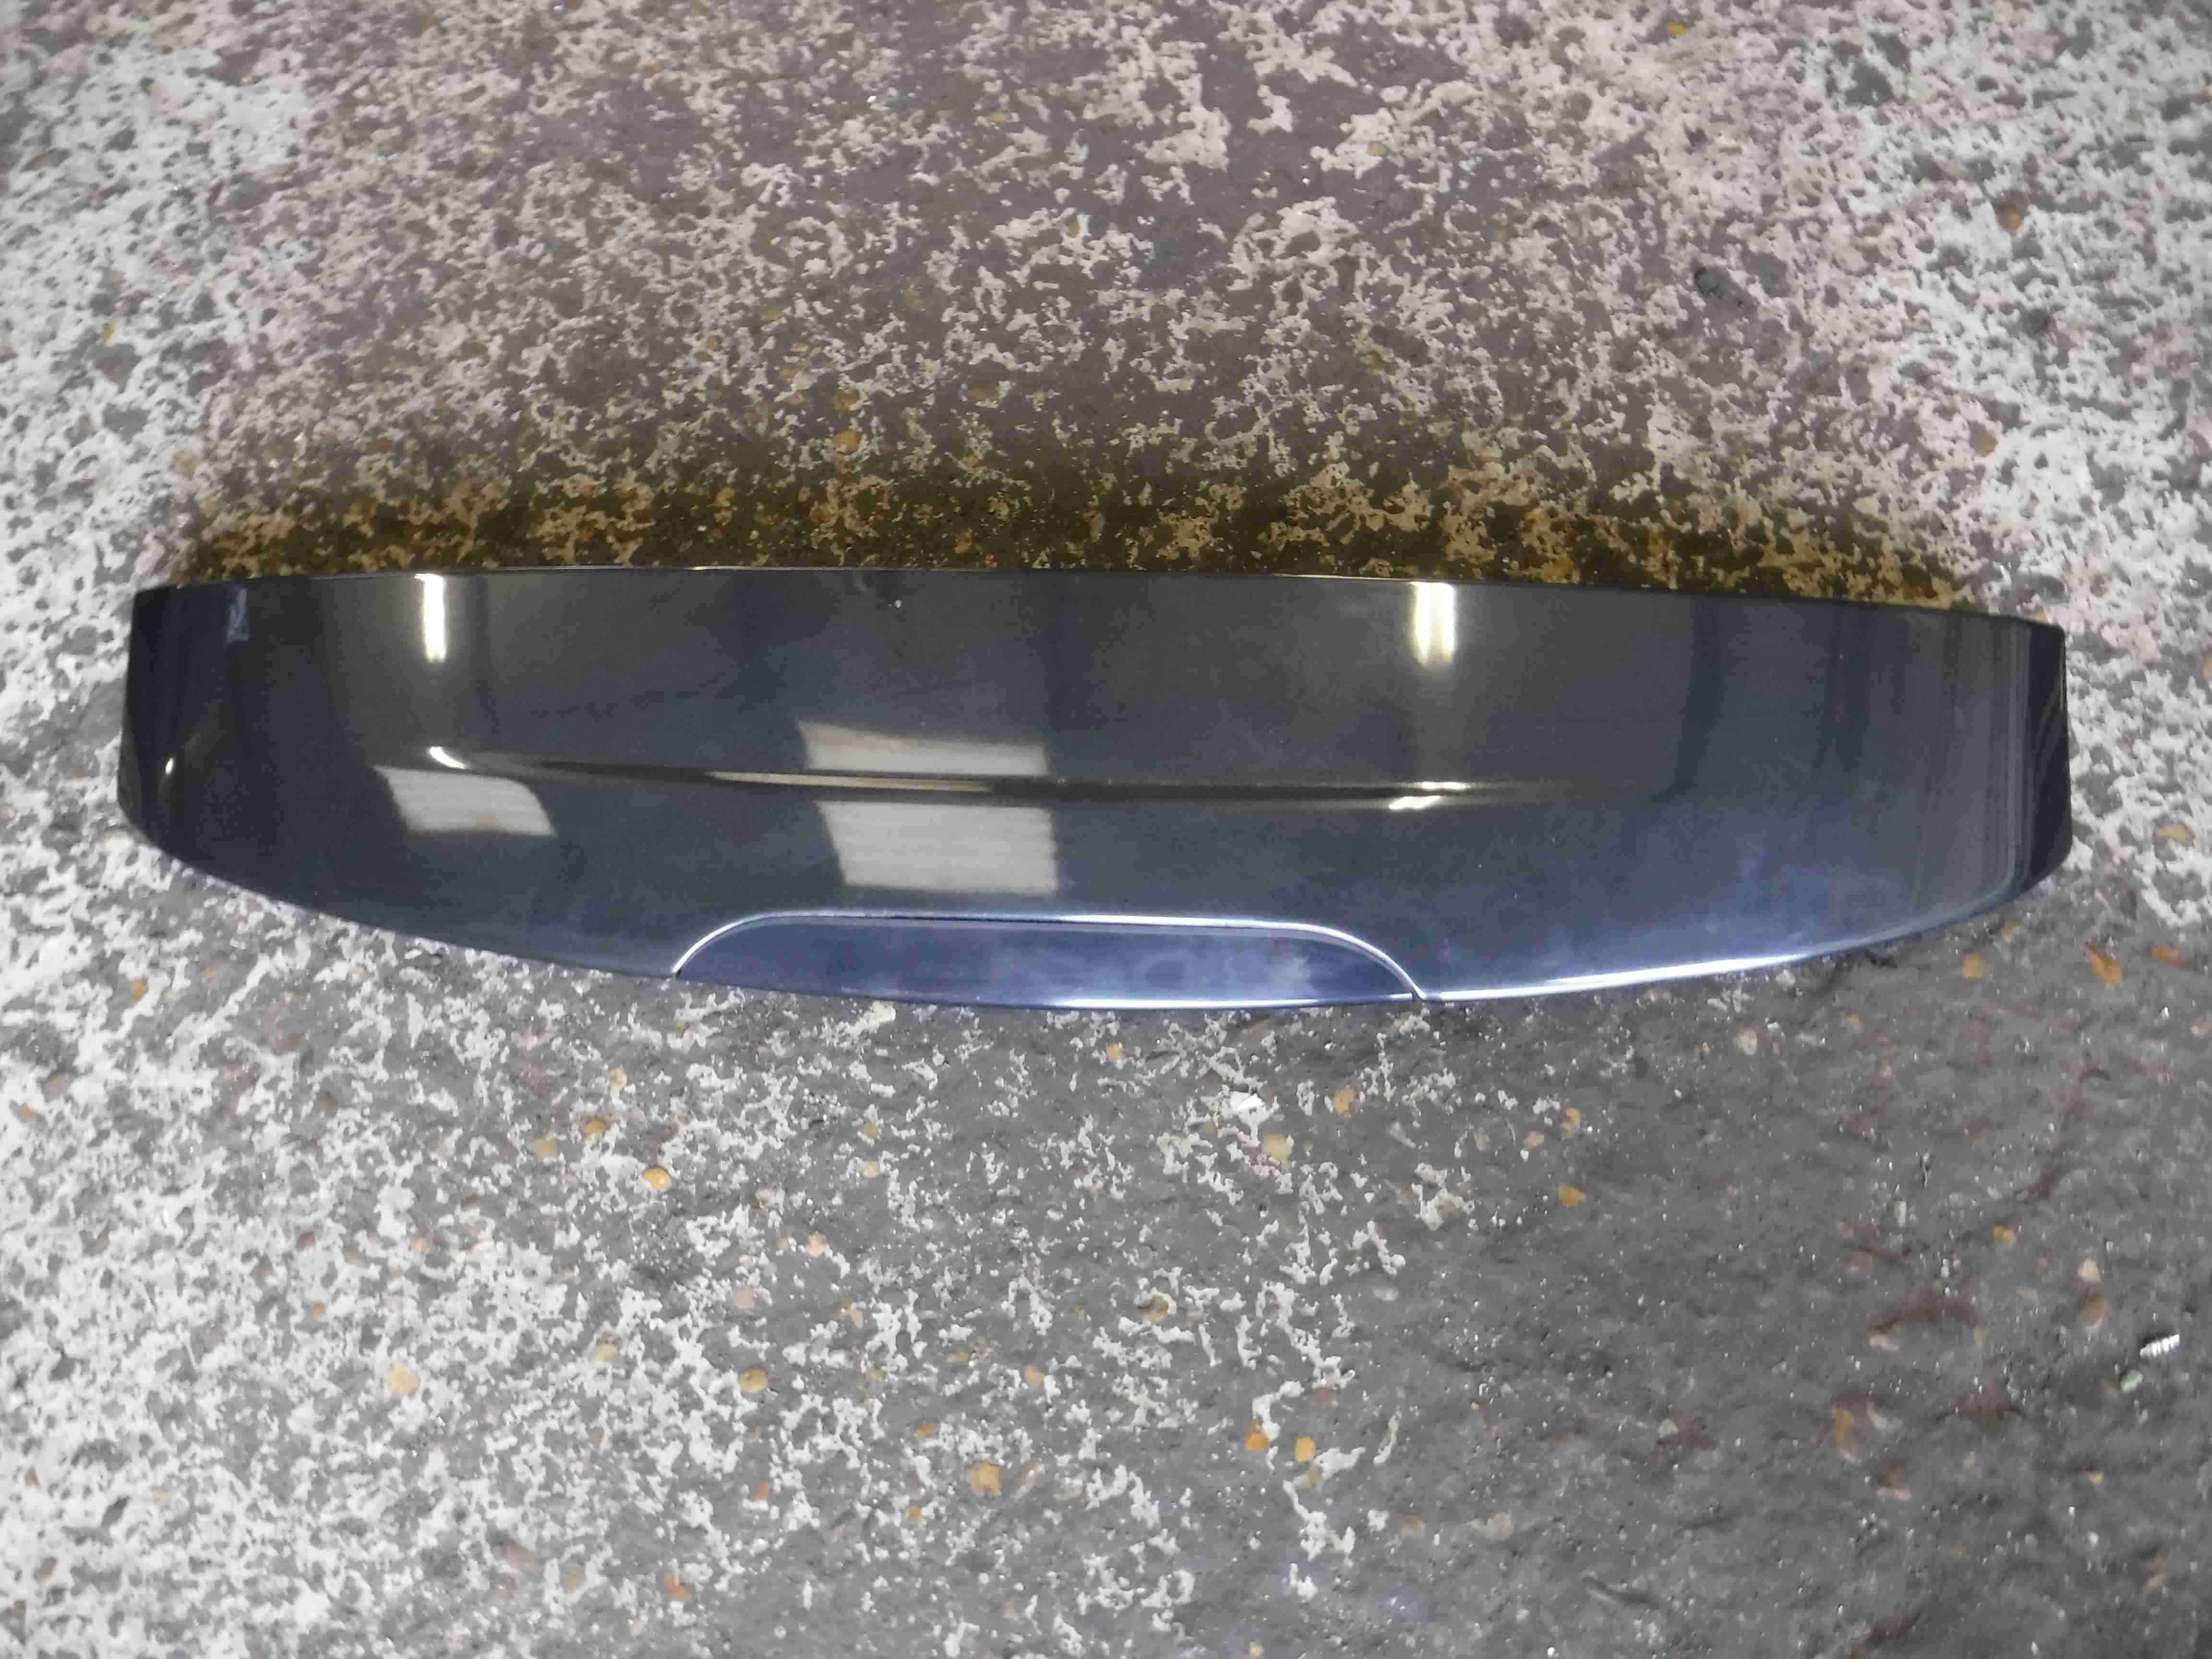 Renault Clio MK2 2001-2006 Rear Boot Tailgate Spoiler Black 676 7700427352